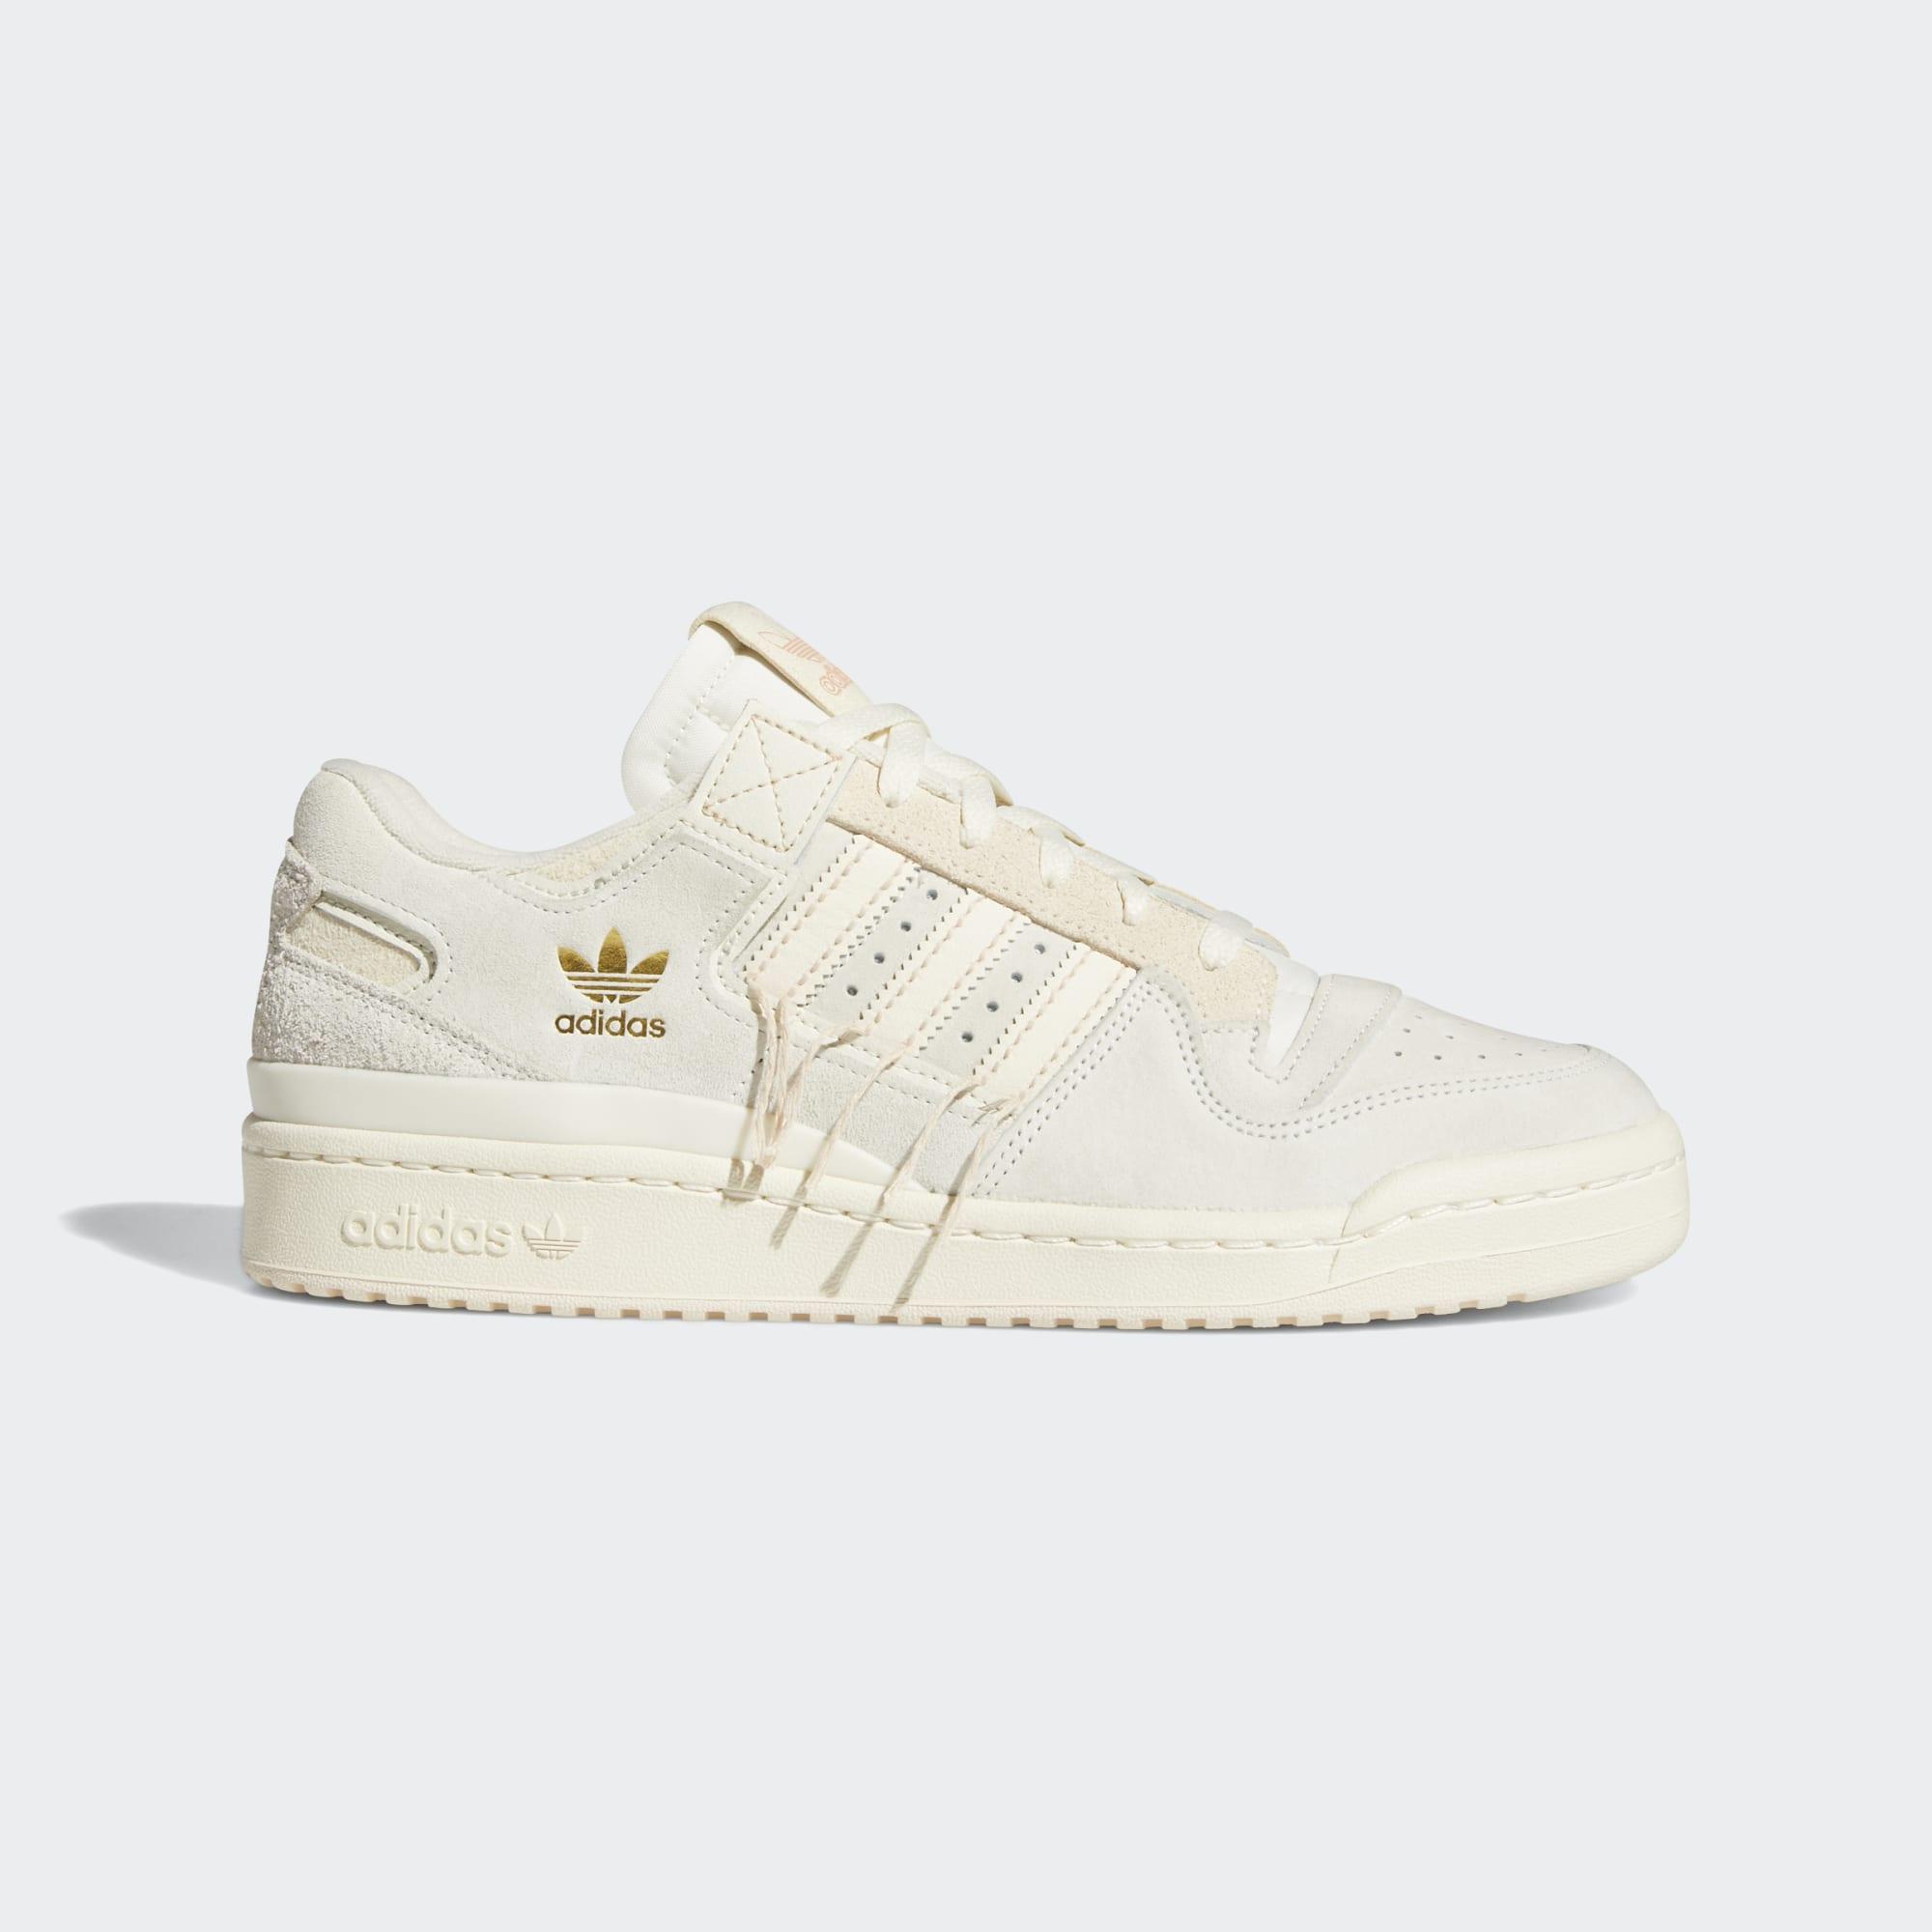 adidas Originals Forum 20 Low   More Sneakers